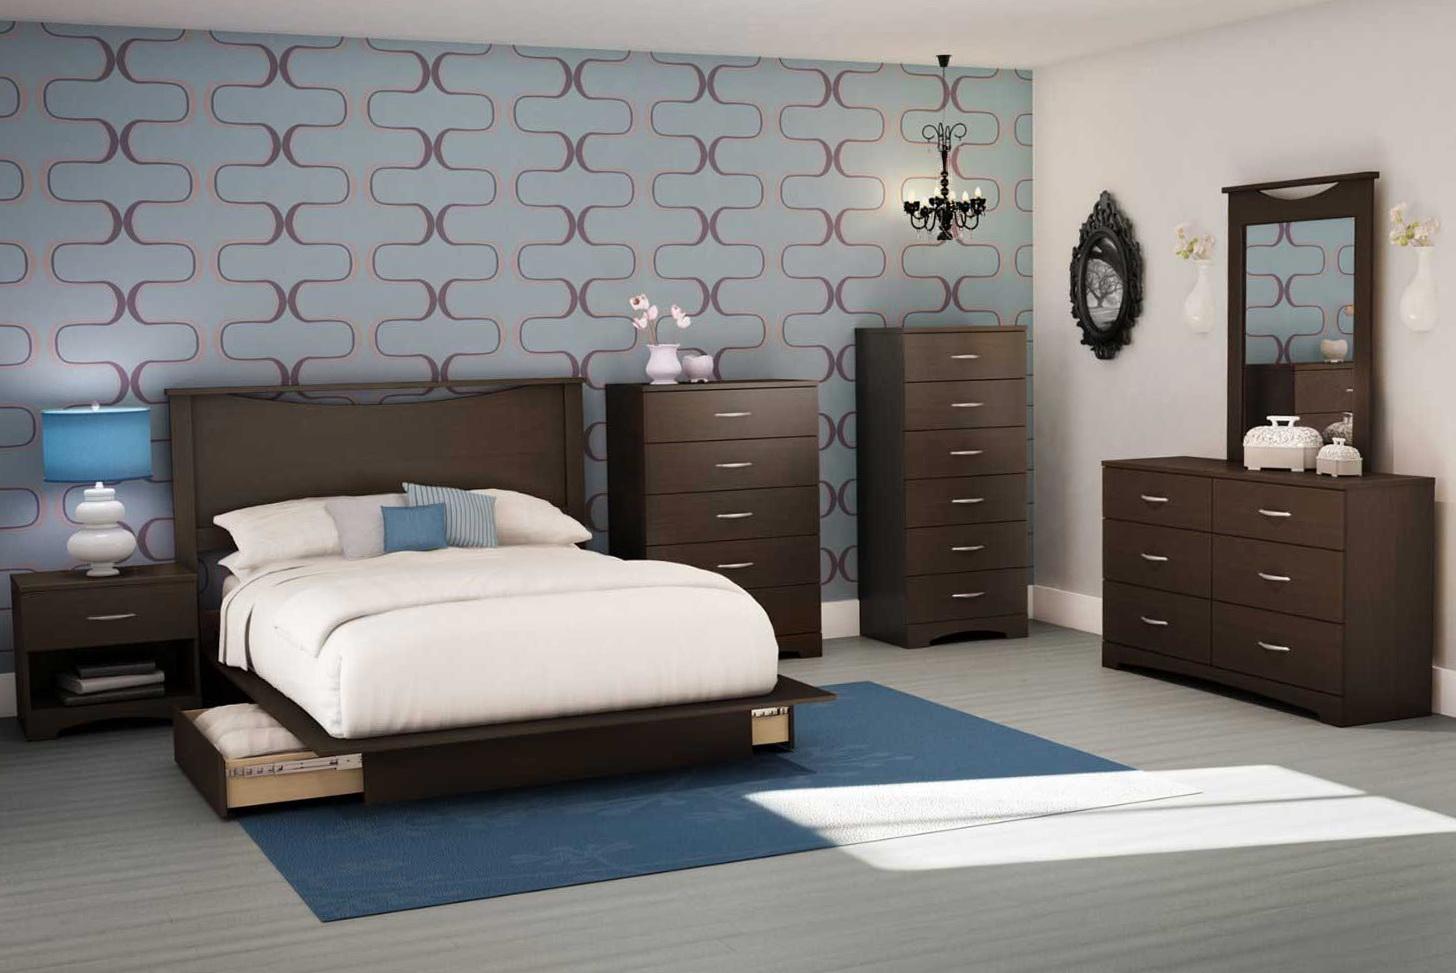 Bedroom Vanity Sets With Drawers